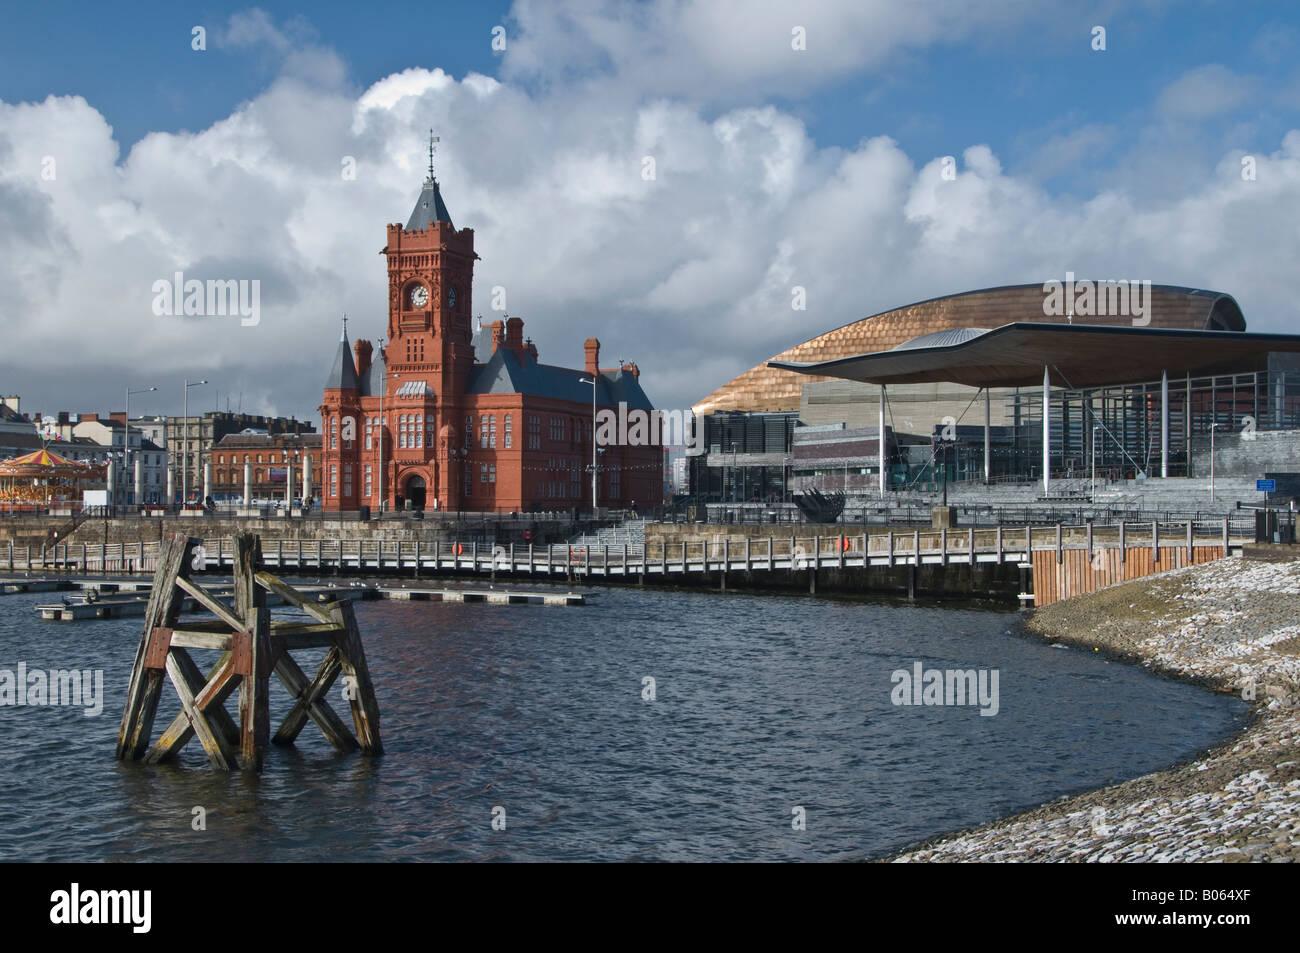 Cardiff Bay waterfront. Stock Photo